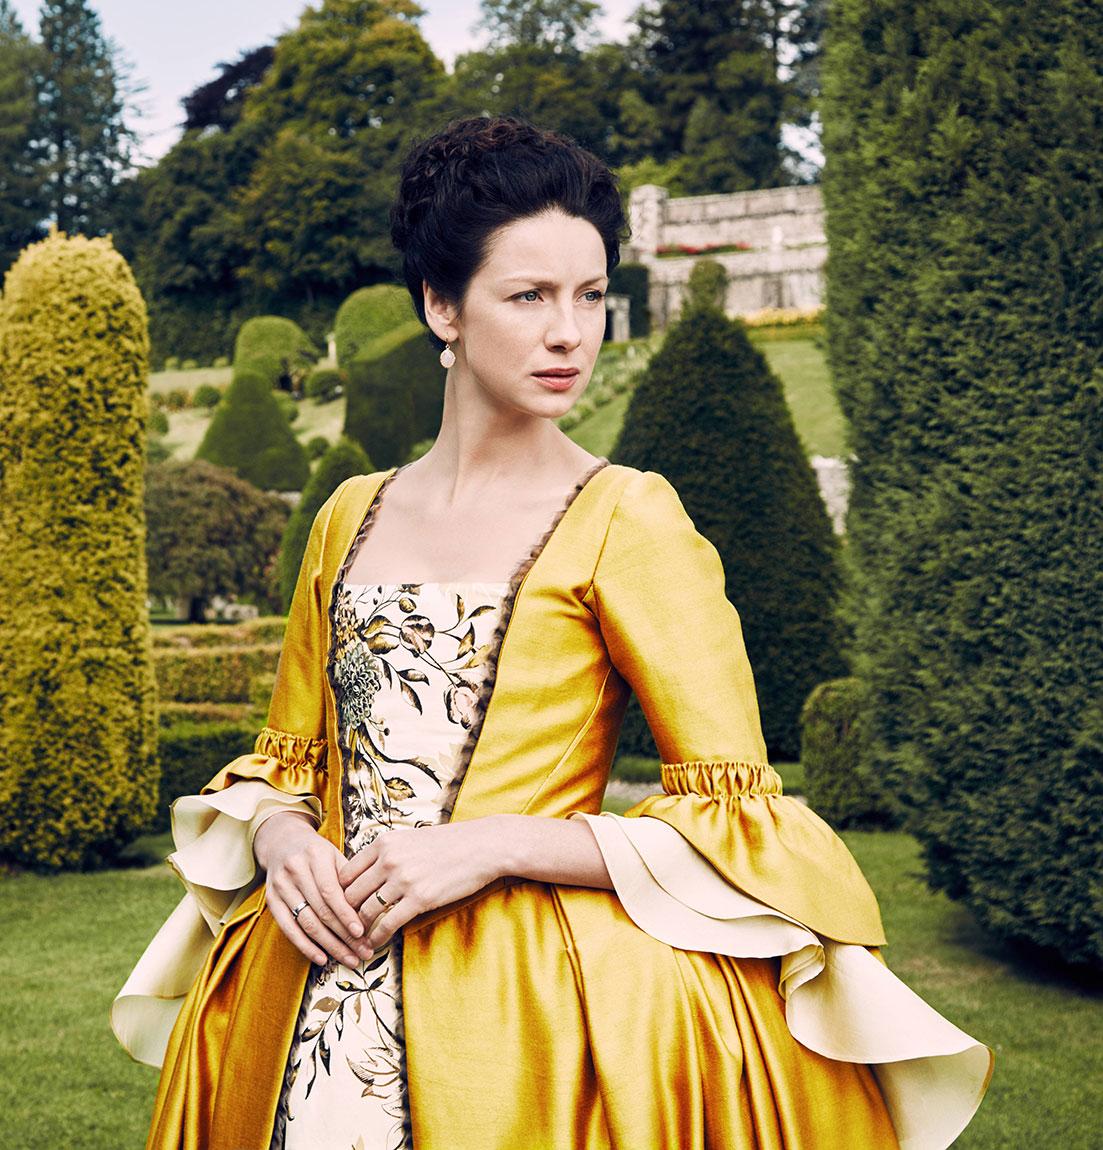 New 39 Outlander 39 Season Two Photos Celebrate The Parisian Costumes Outlander Tv News